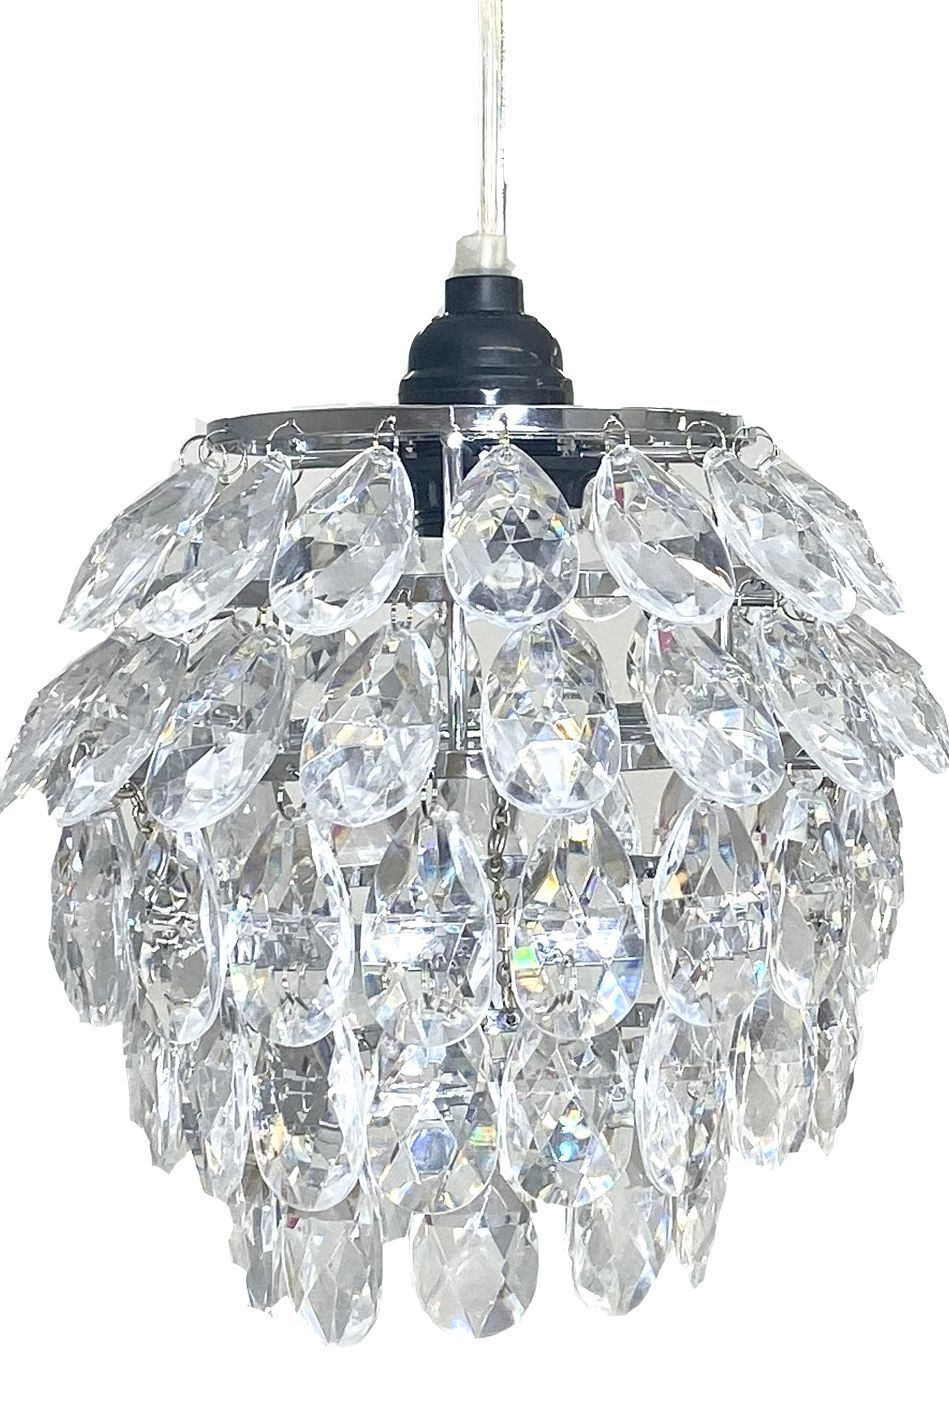 Chandelier Huge Pendant Beads 5 Tiers W Light Kit Centerpiece